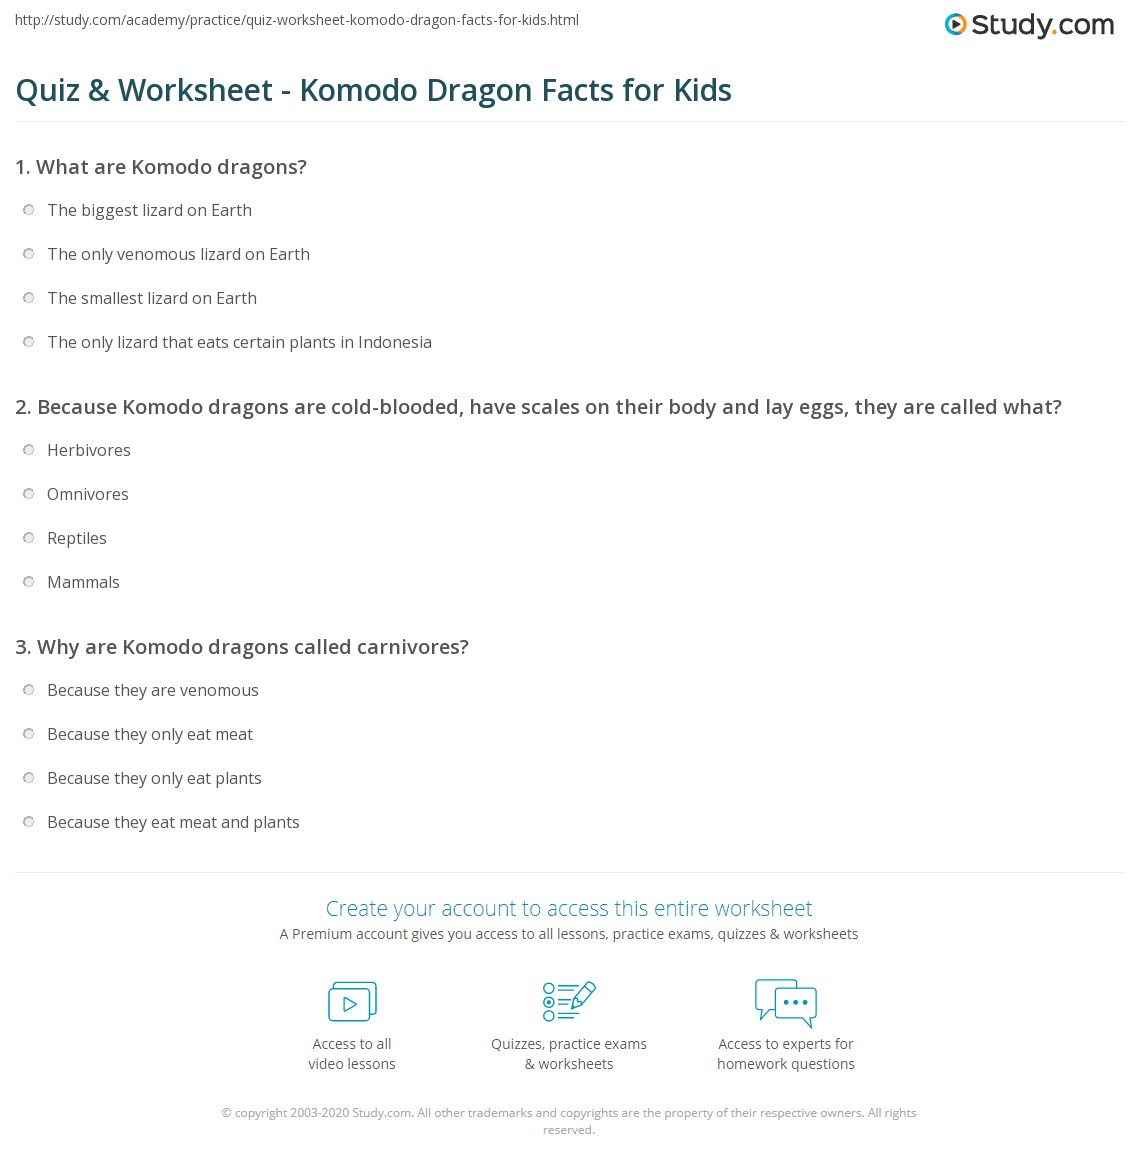 Quiz & Worksheet - Komodo Dragon Facts for Kids | Study.com